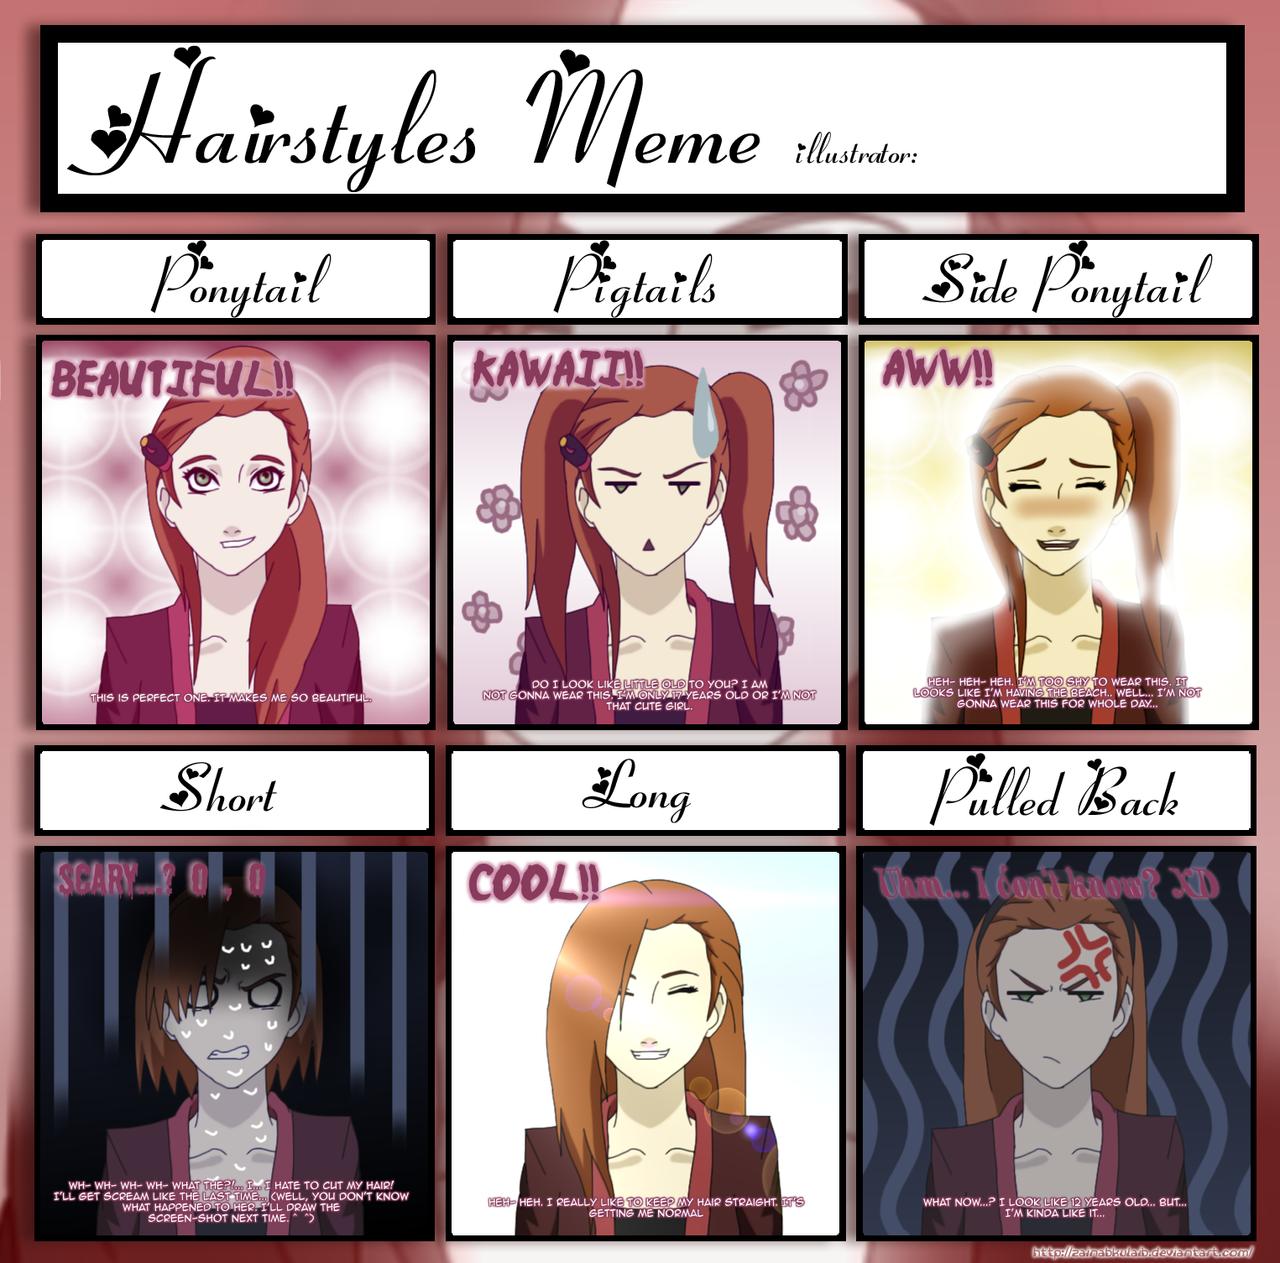 Hairstyle Meme Name